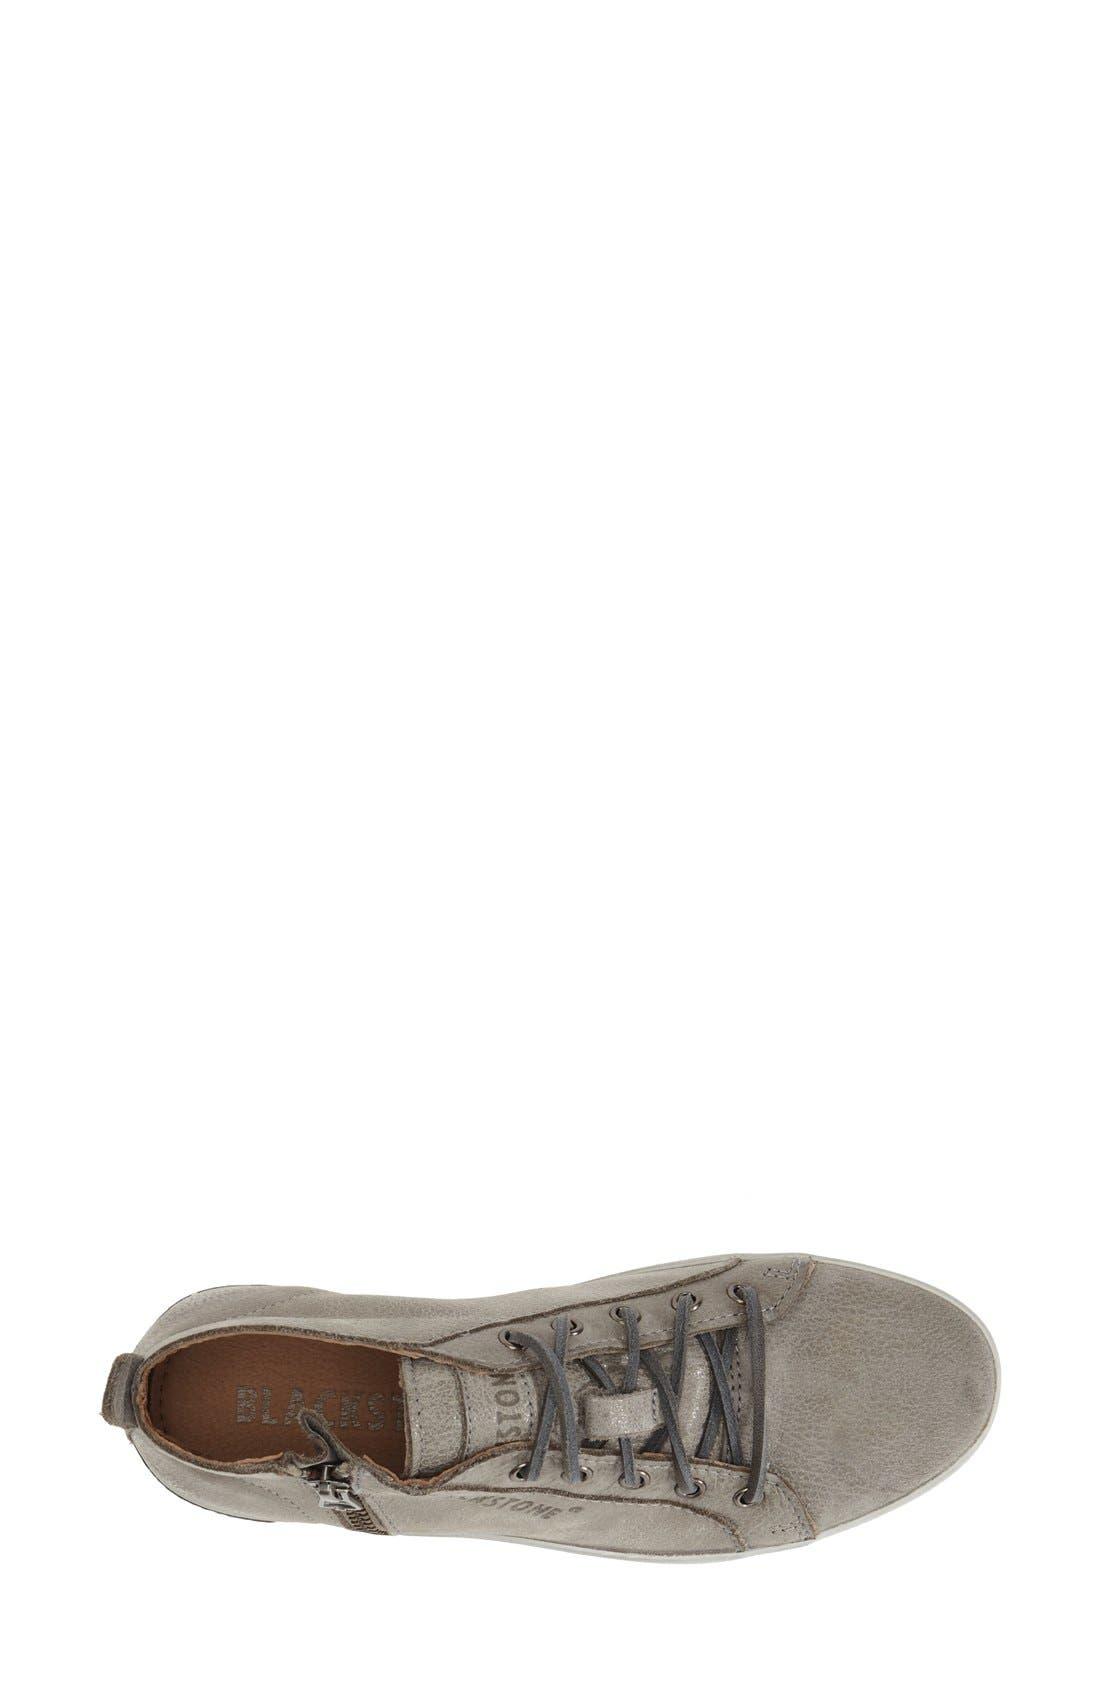 Alternate Image 3  - Blackstone 'JL17' Sneaker (Women)